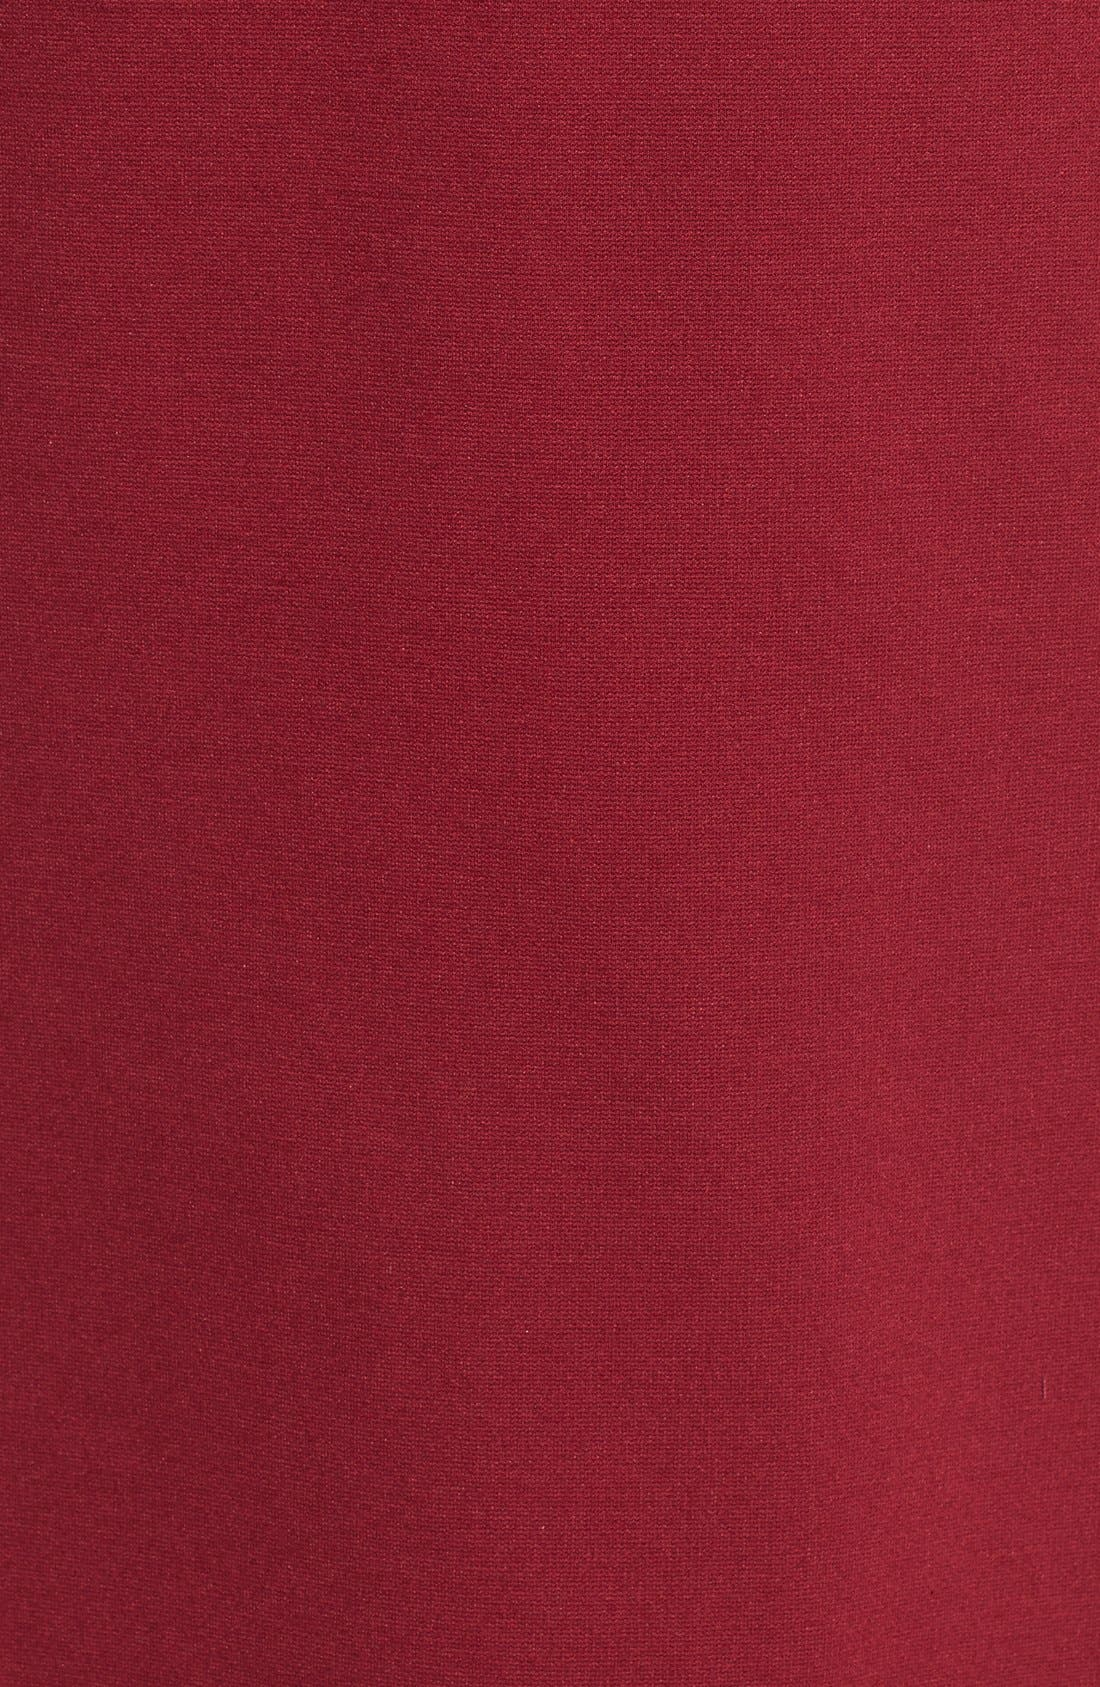 Scalloped V-Neck A-Line Dress,                             Alternate thumbnail 4, color,                             690